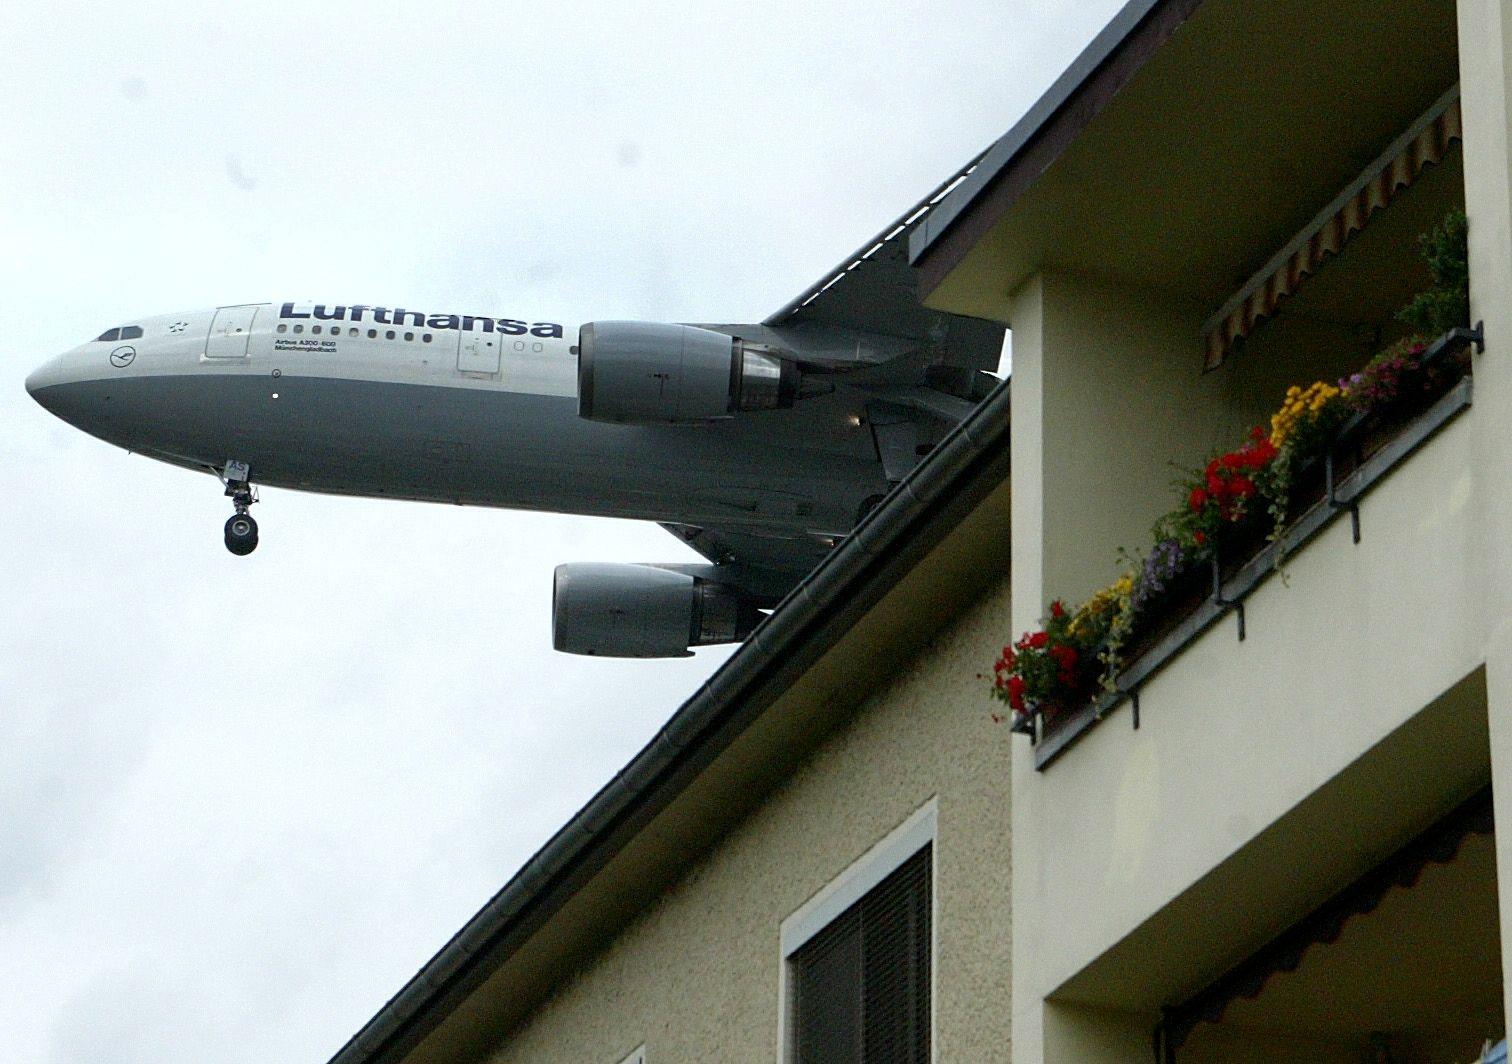 NICHT VERWENDEN Fluglärm / Flughafen Berlin-Tegel